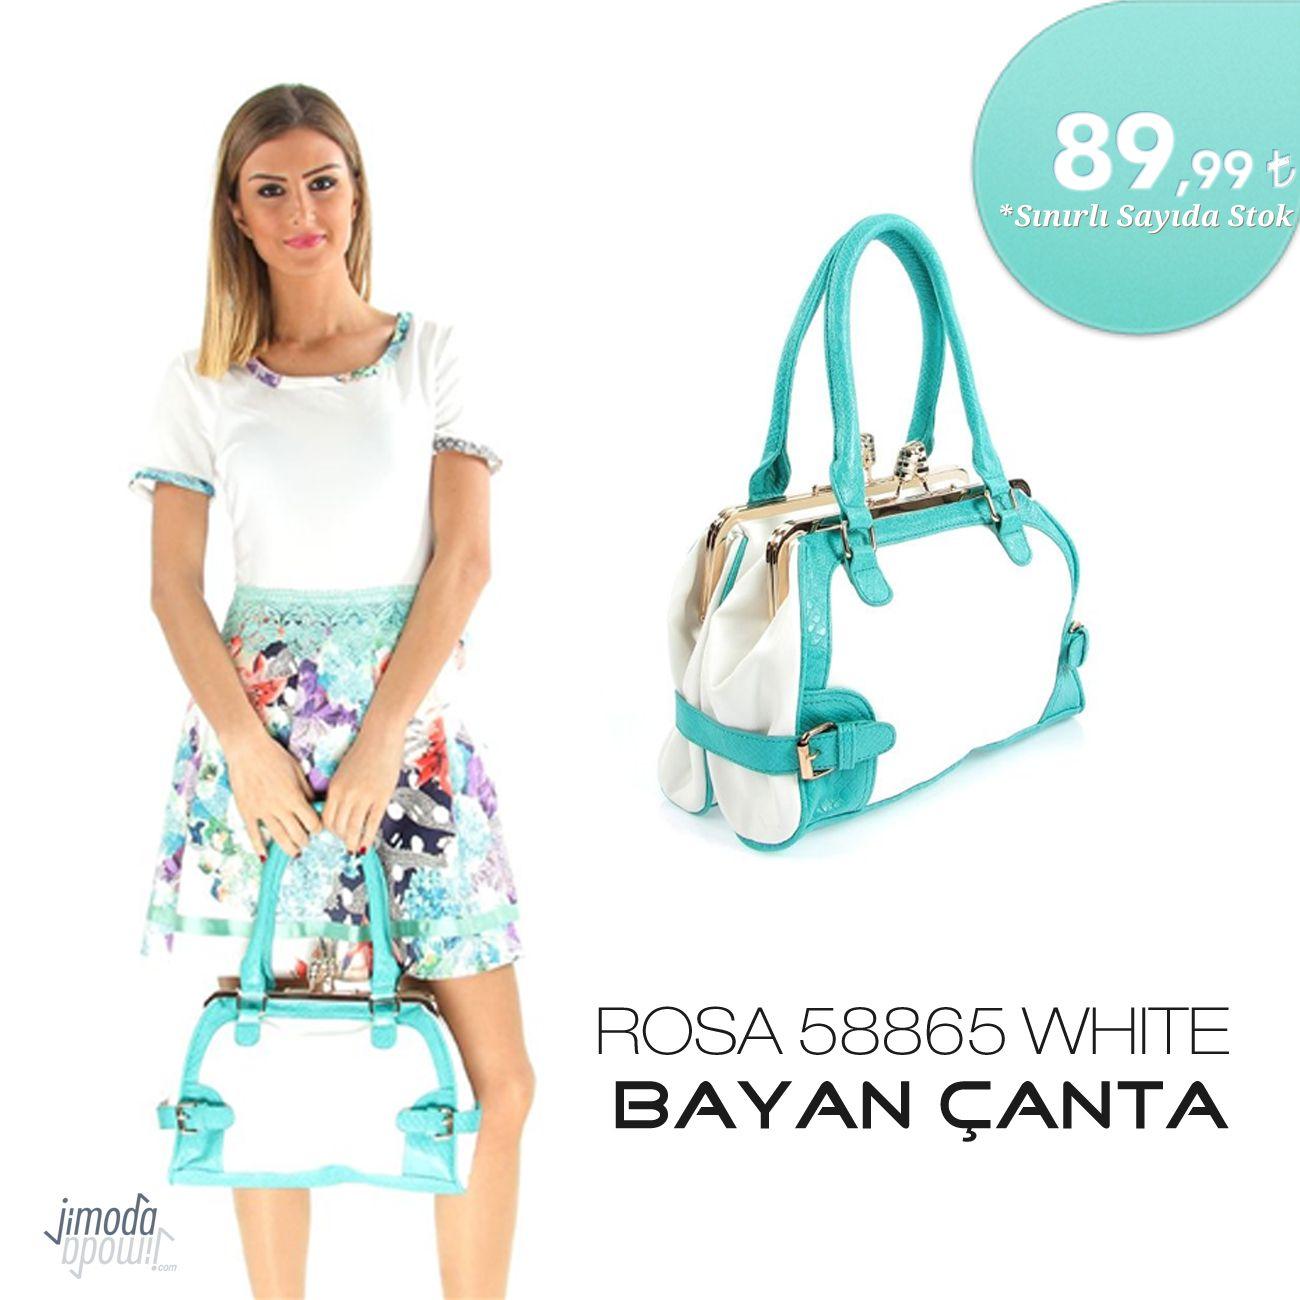 Her Kadinin Canta Koleksiyonunda Bulunmasi Gereken Bir Model Rosa 58865 White Bayan Canta Jimoda Com Da Canta Bag Bayan Giyim Akses Moda Canta Trendler